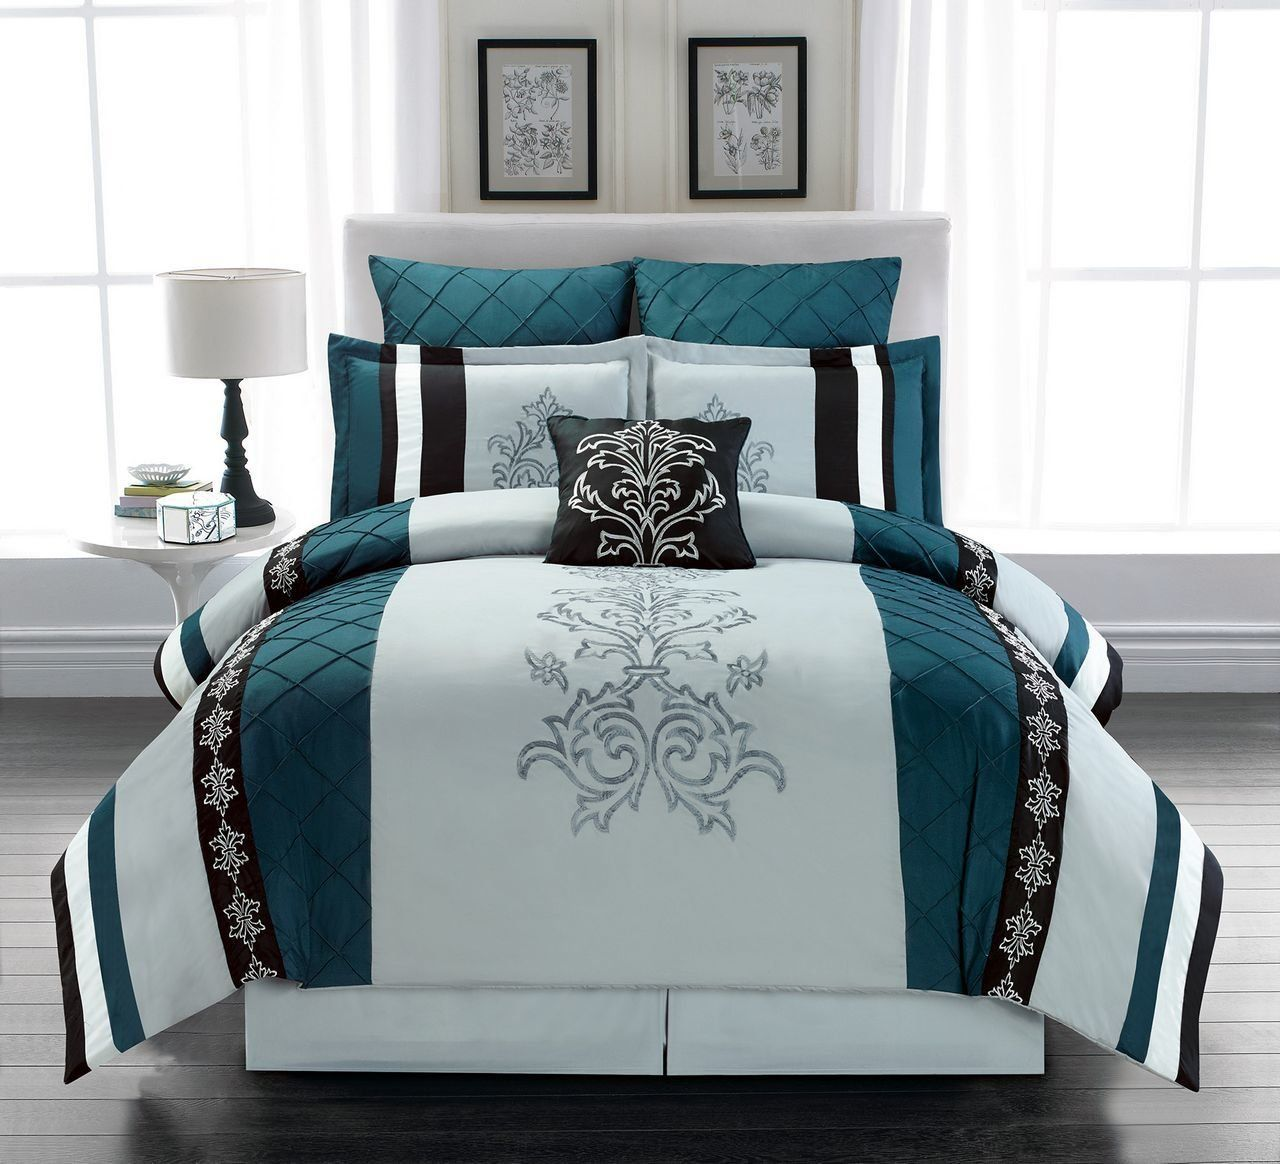 7 Piece Magee Teal Gray Comforter Set Grey Comforter Grey